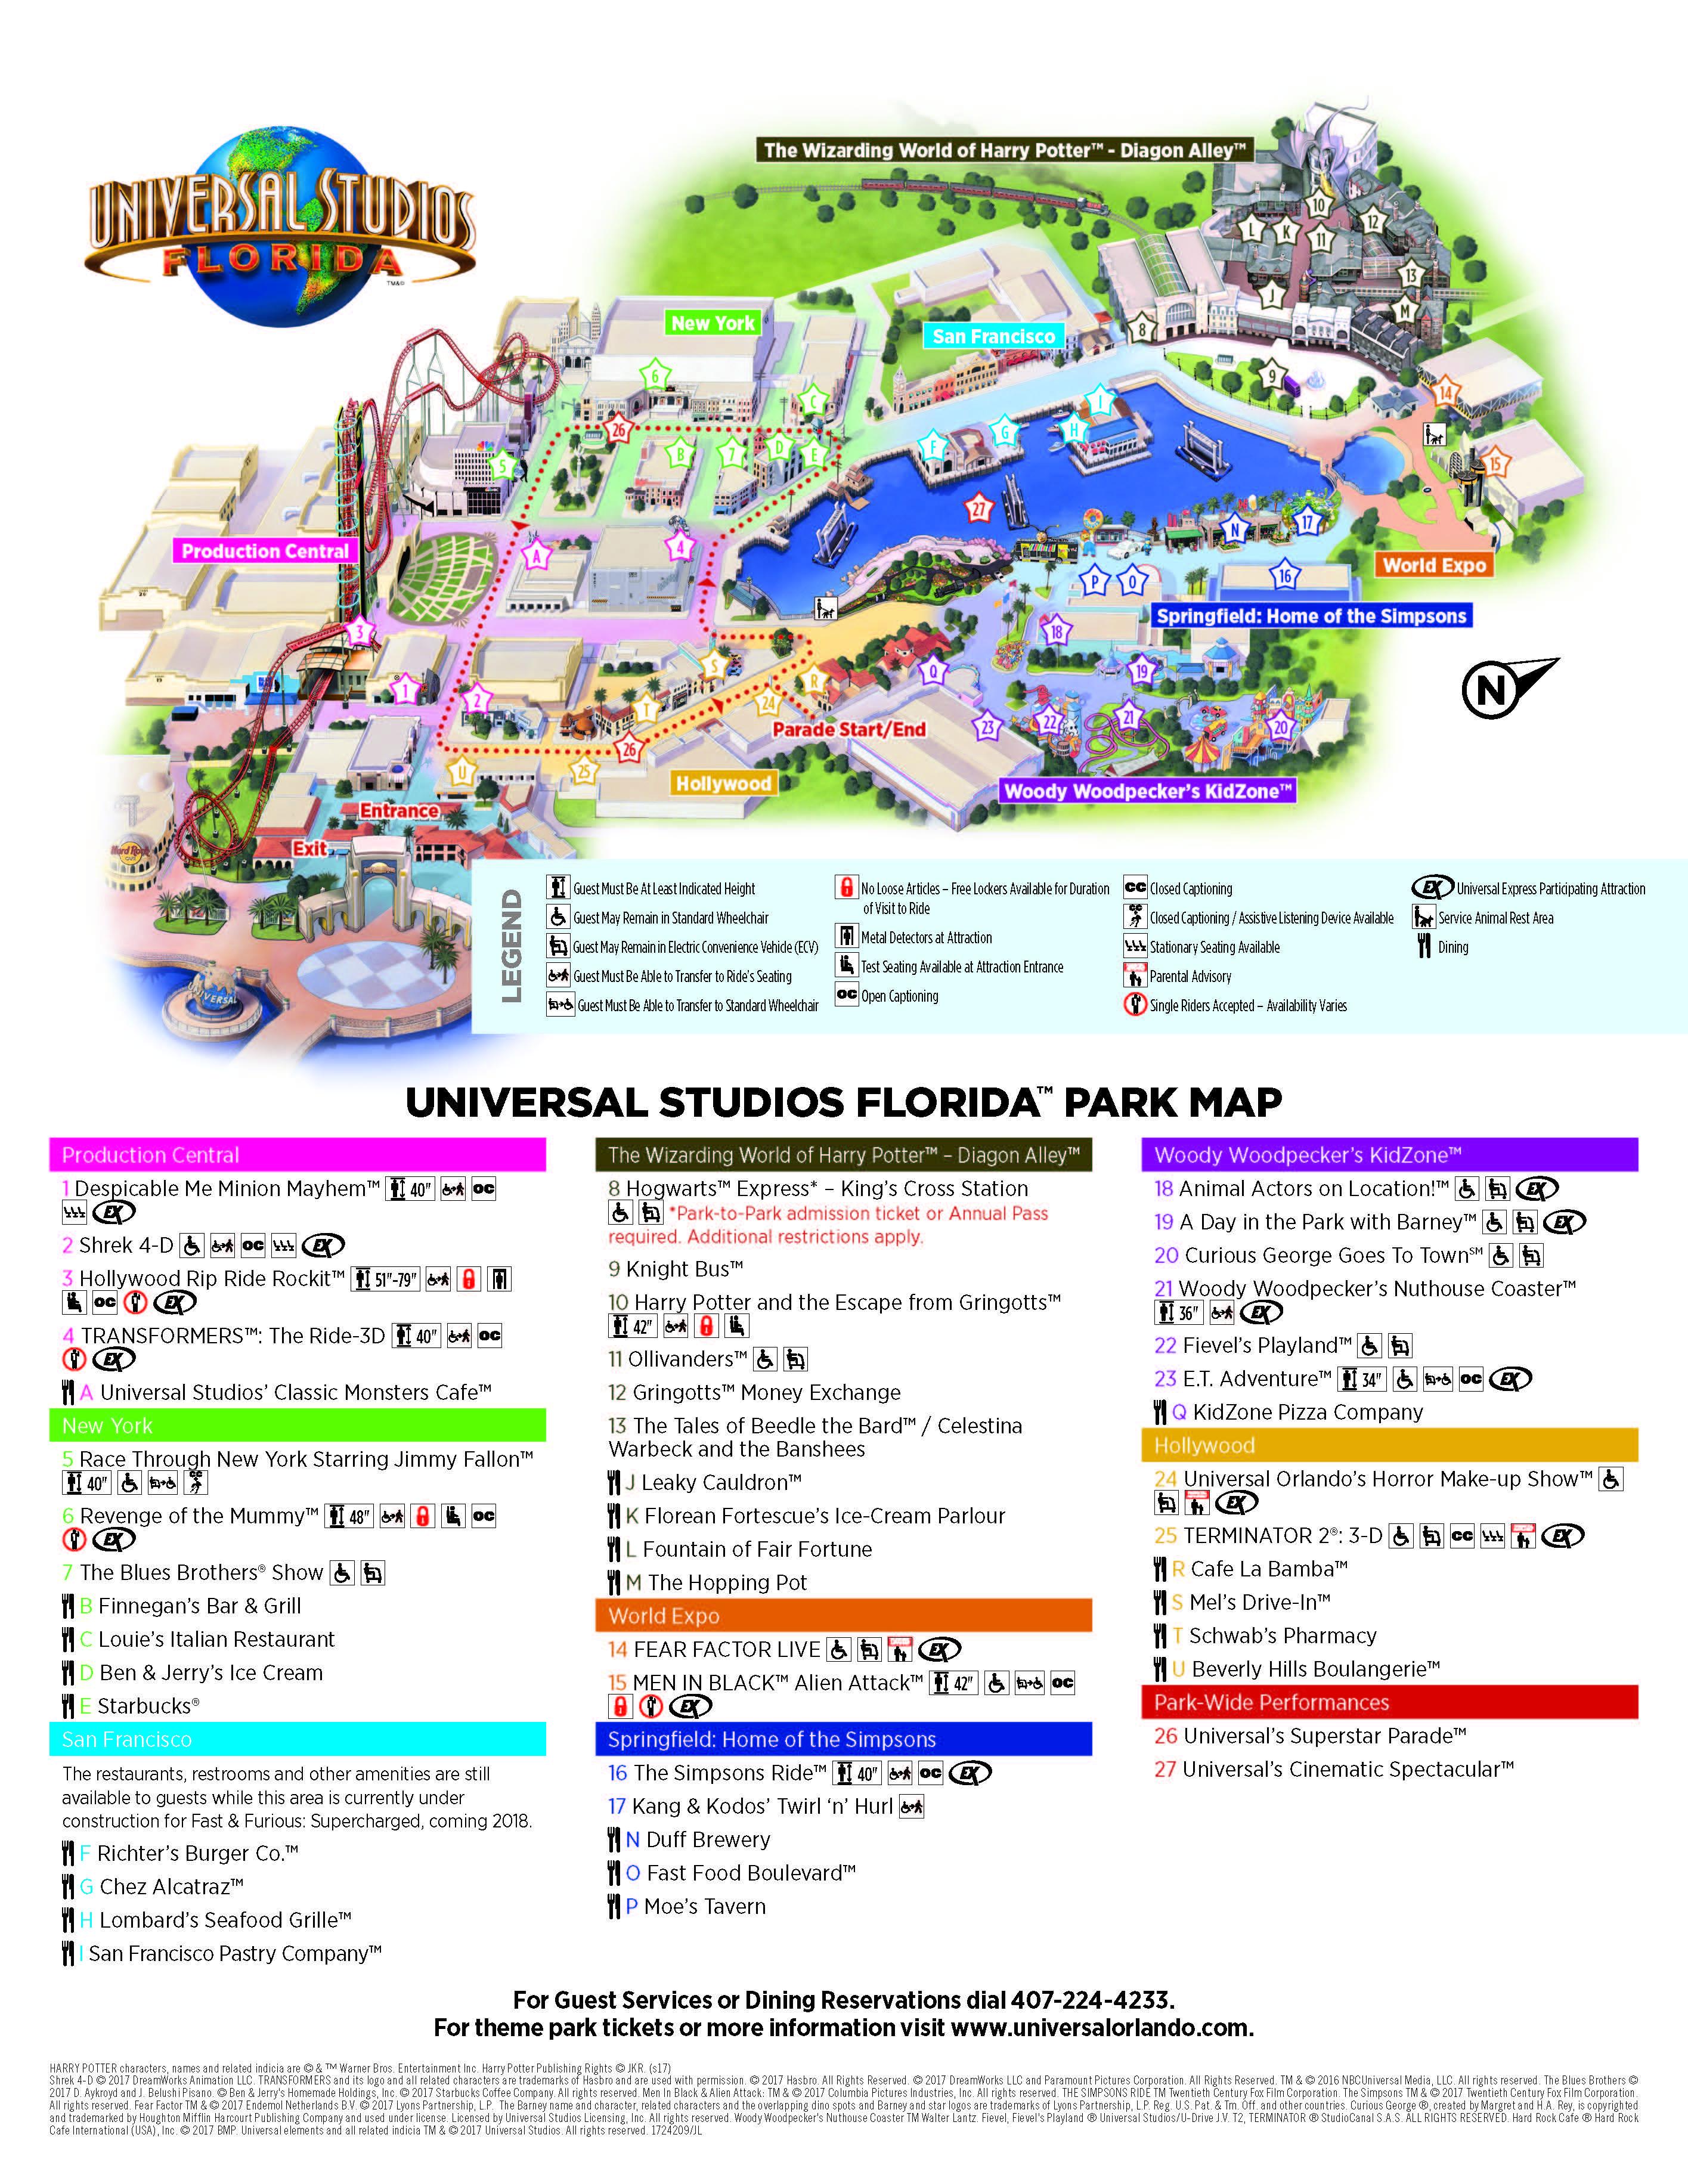 Universal Studios Orlando Information | Visit Orlando - Universal Studios Florida Map